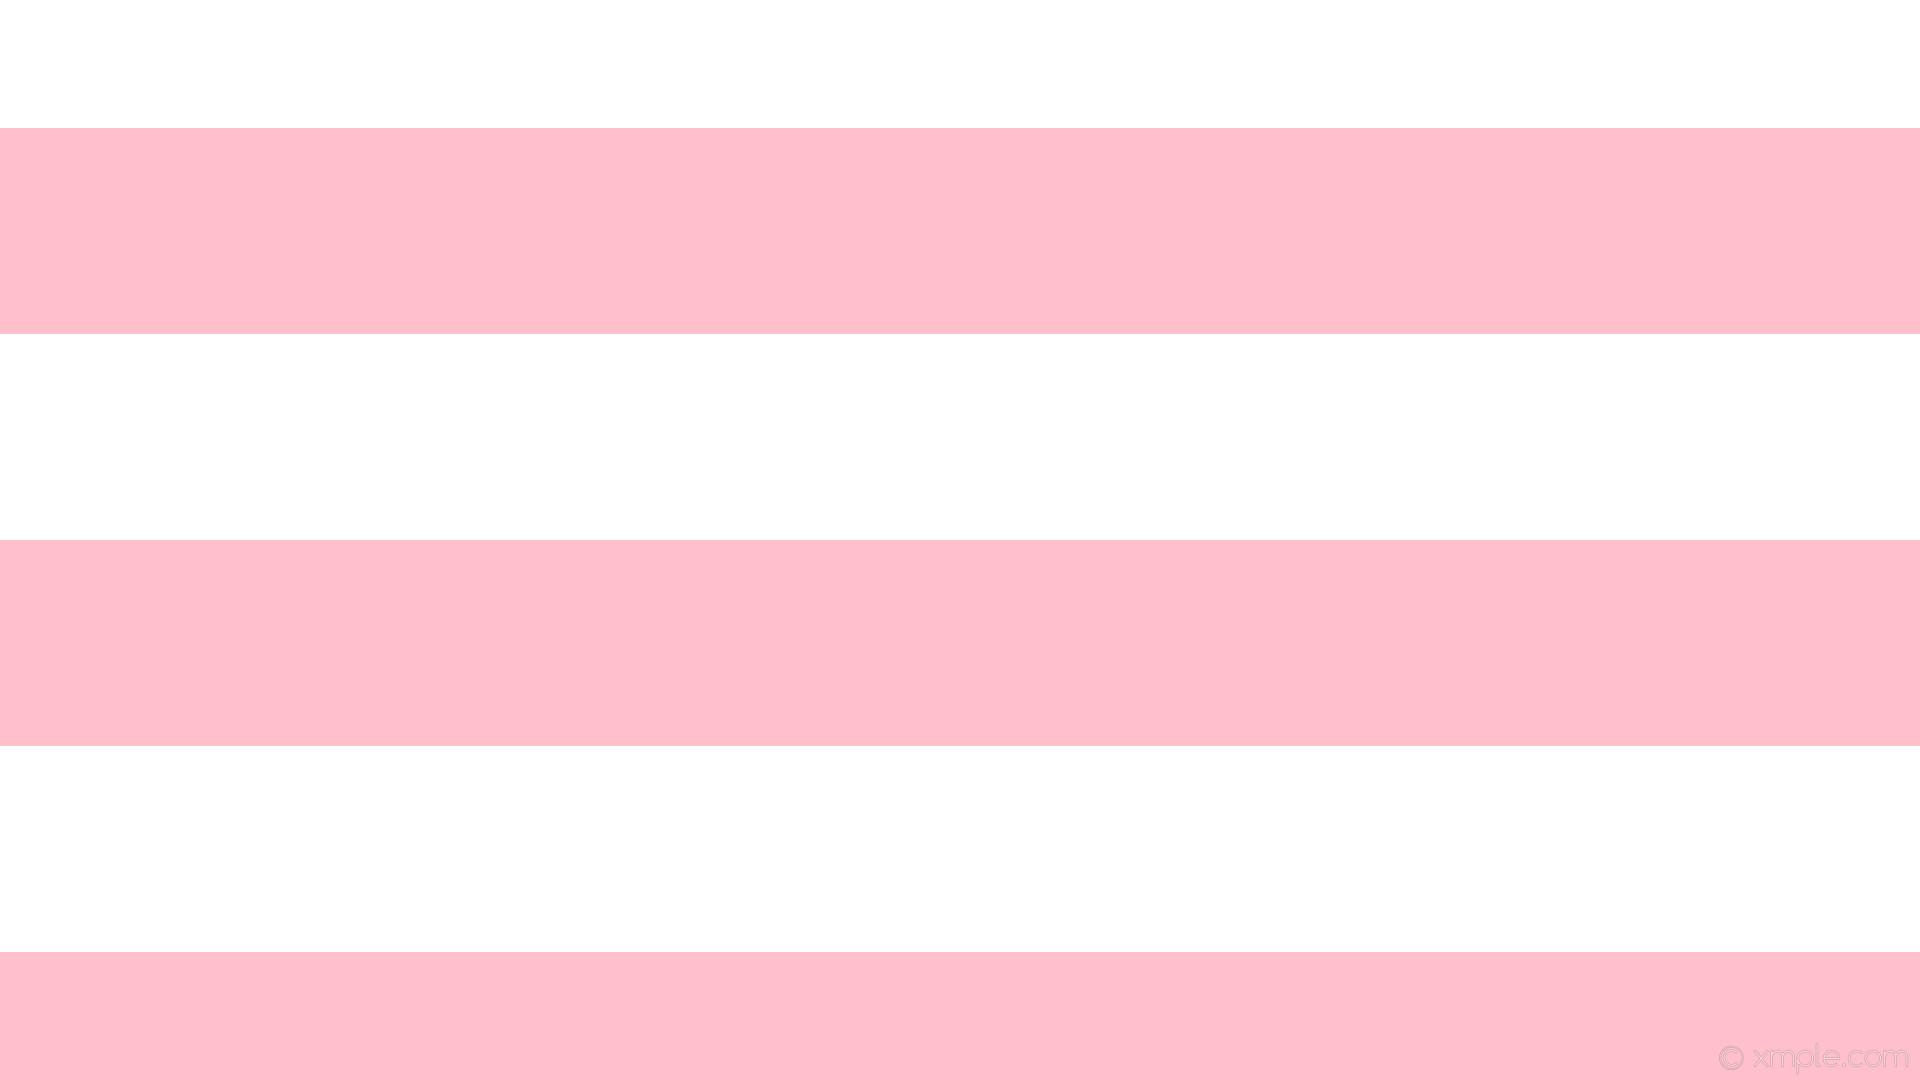 wallpaper stripes streaks lines white pink #ffc0cb #ffffff horizontal 206px